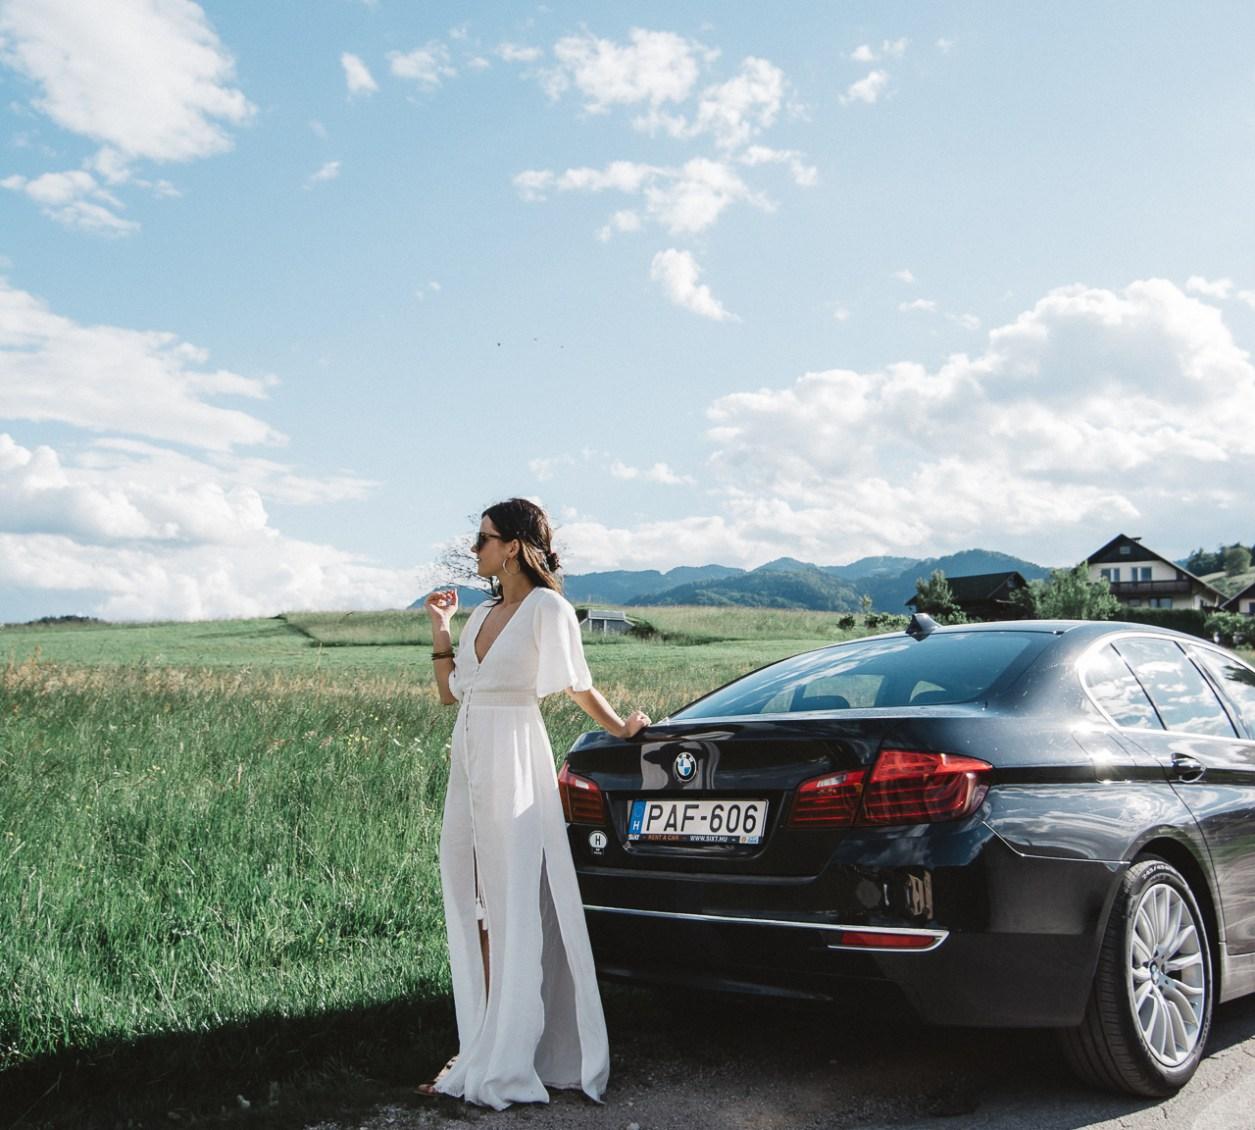 Triglav National Park Sixt Rental Car